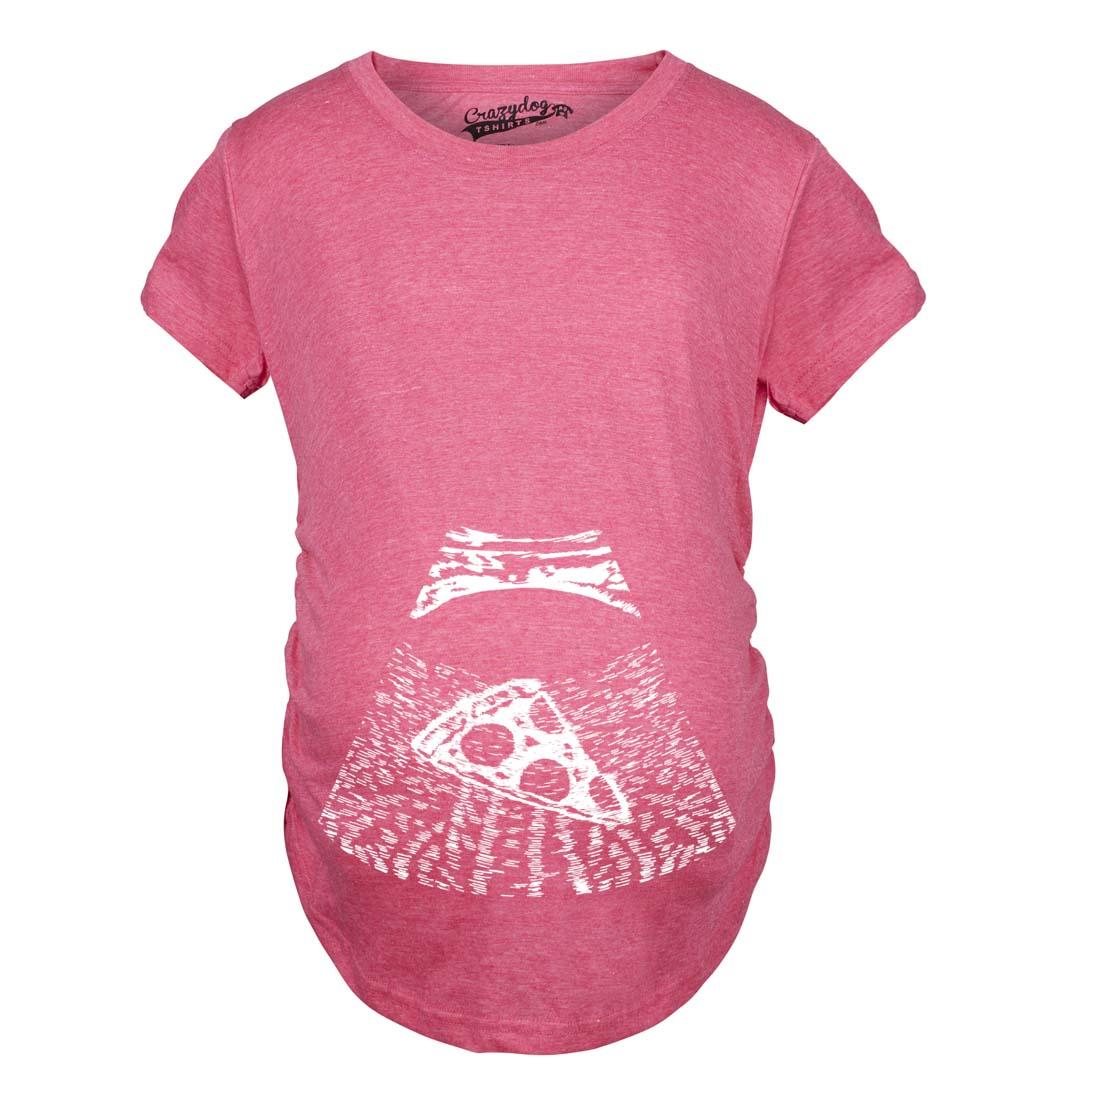 Maternity Ultrasound Pizza Funny T shirt Cheap Pregnancy ...